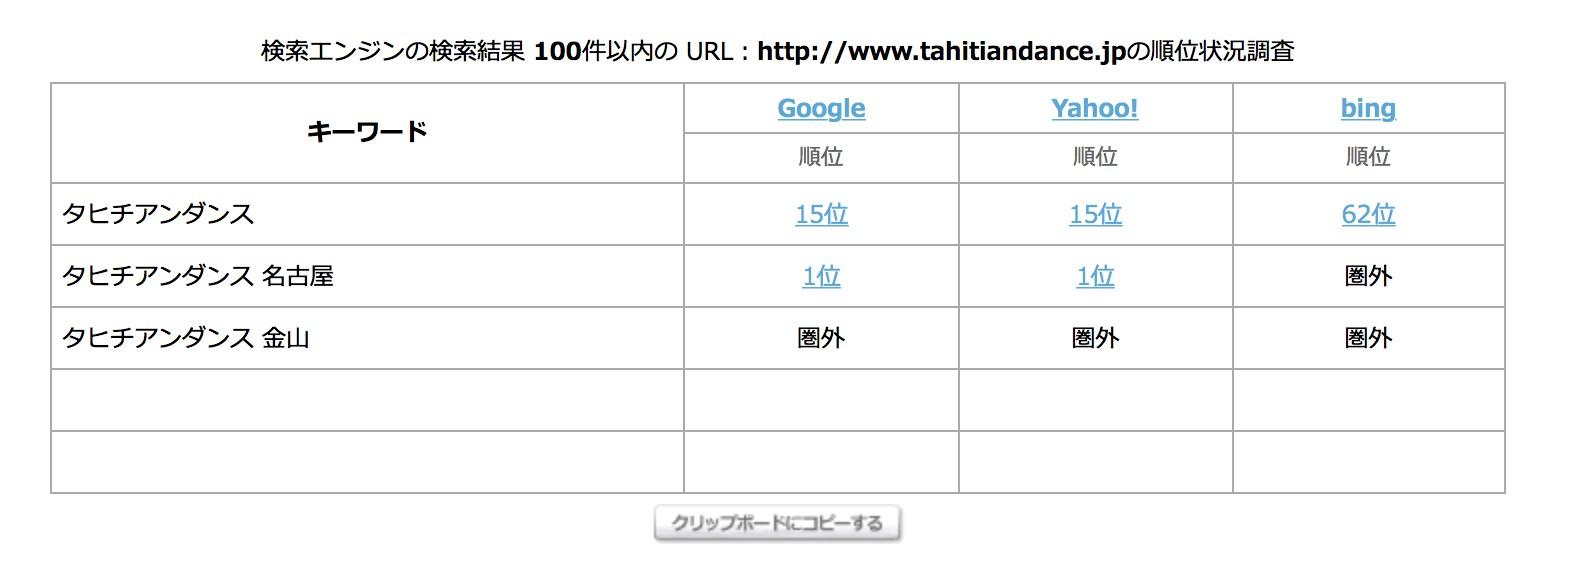 image-Googleの検索順位チェックツールを、本気で比較してみた | WordPressを使ったホームページヒーリングソリューションズ